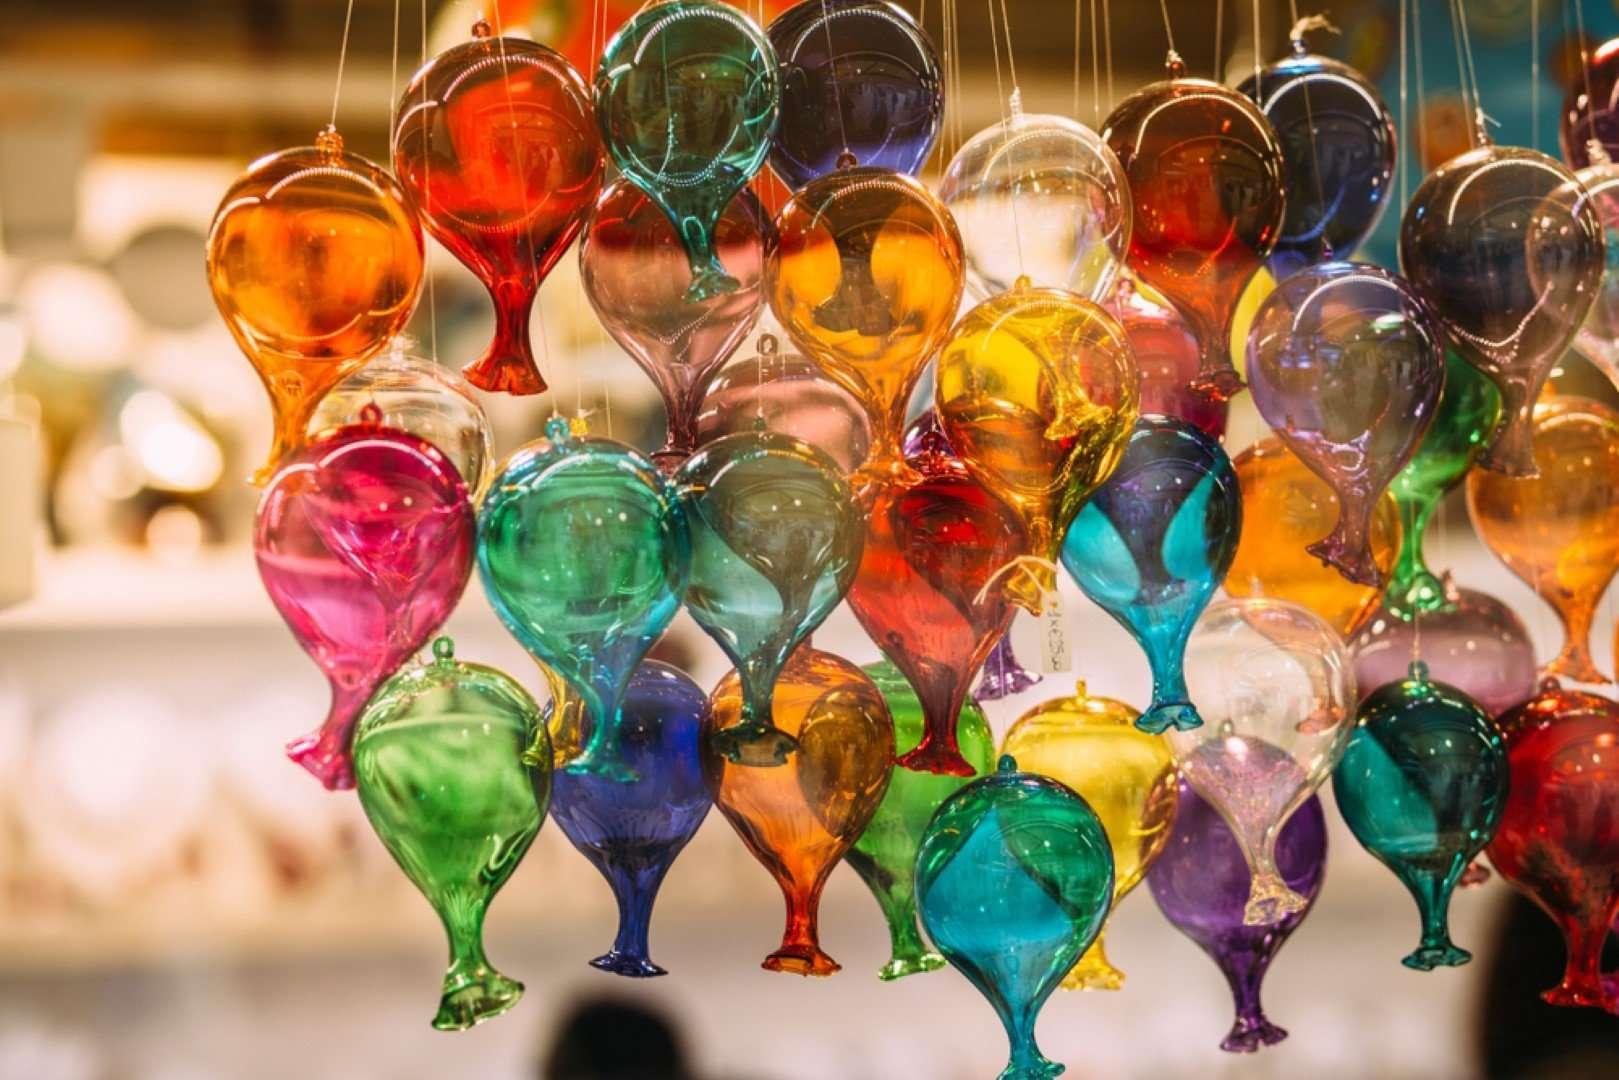 glas uit murano - venetie - italie